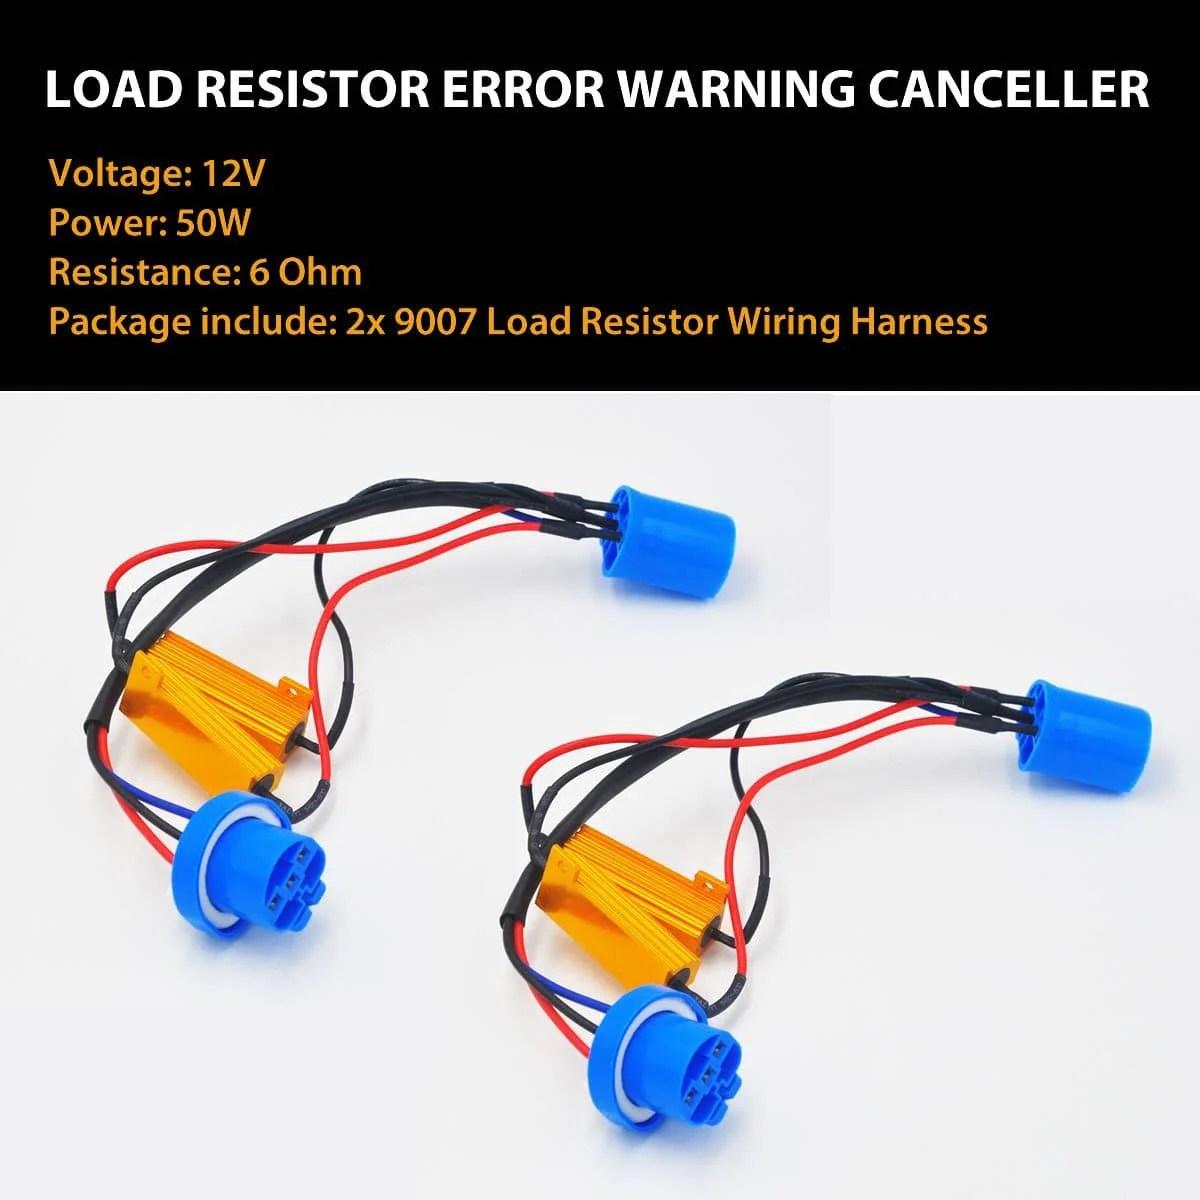 9007 9004 led headlight load resistor harness anti flicker warning canceler [ 1200 x 1200 Pixel ]